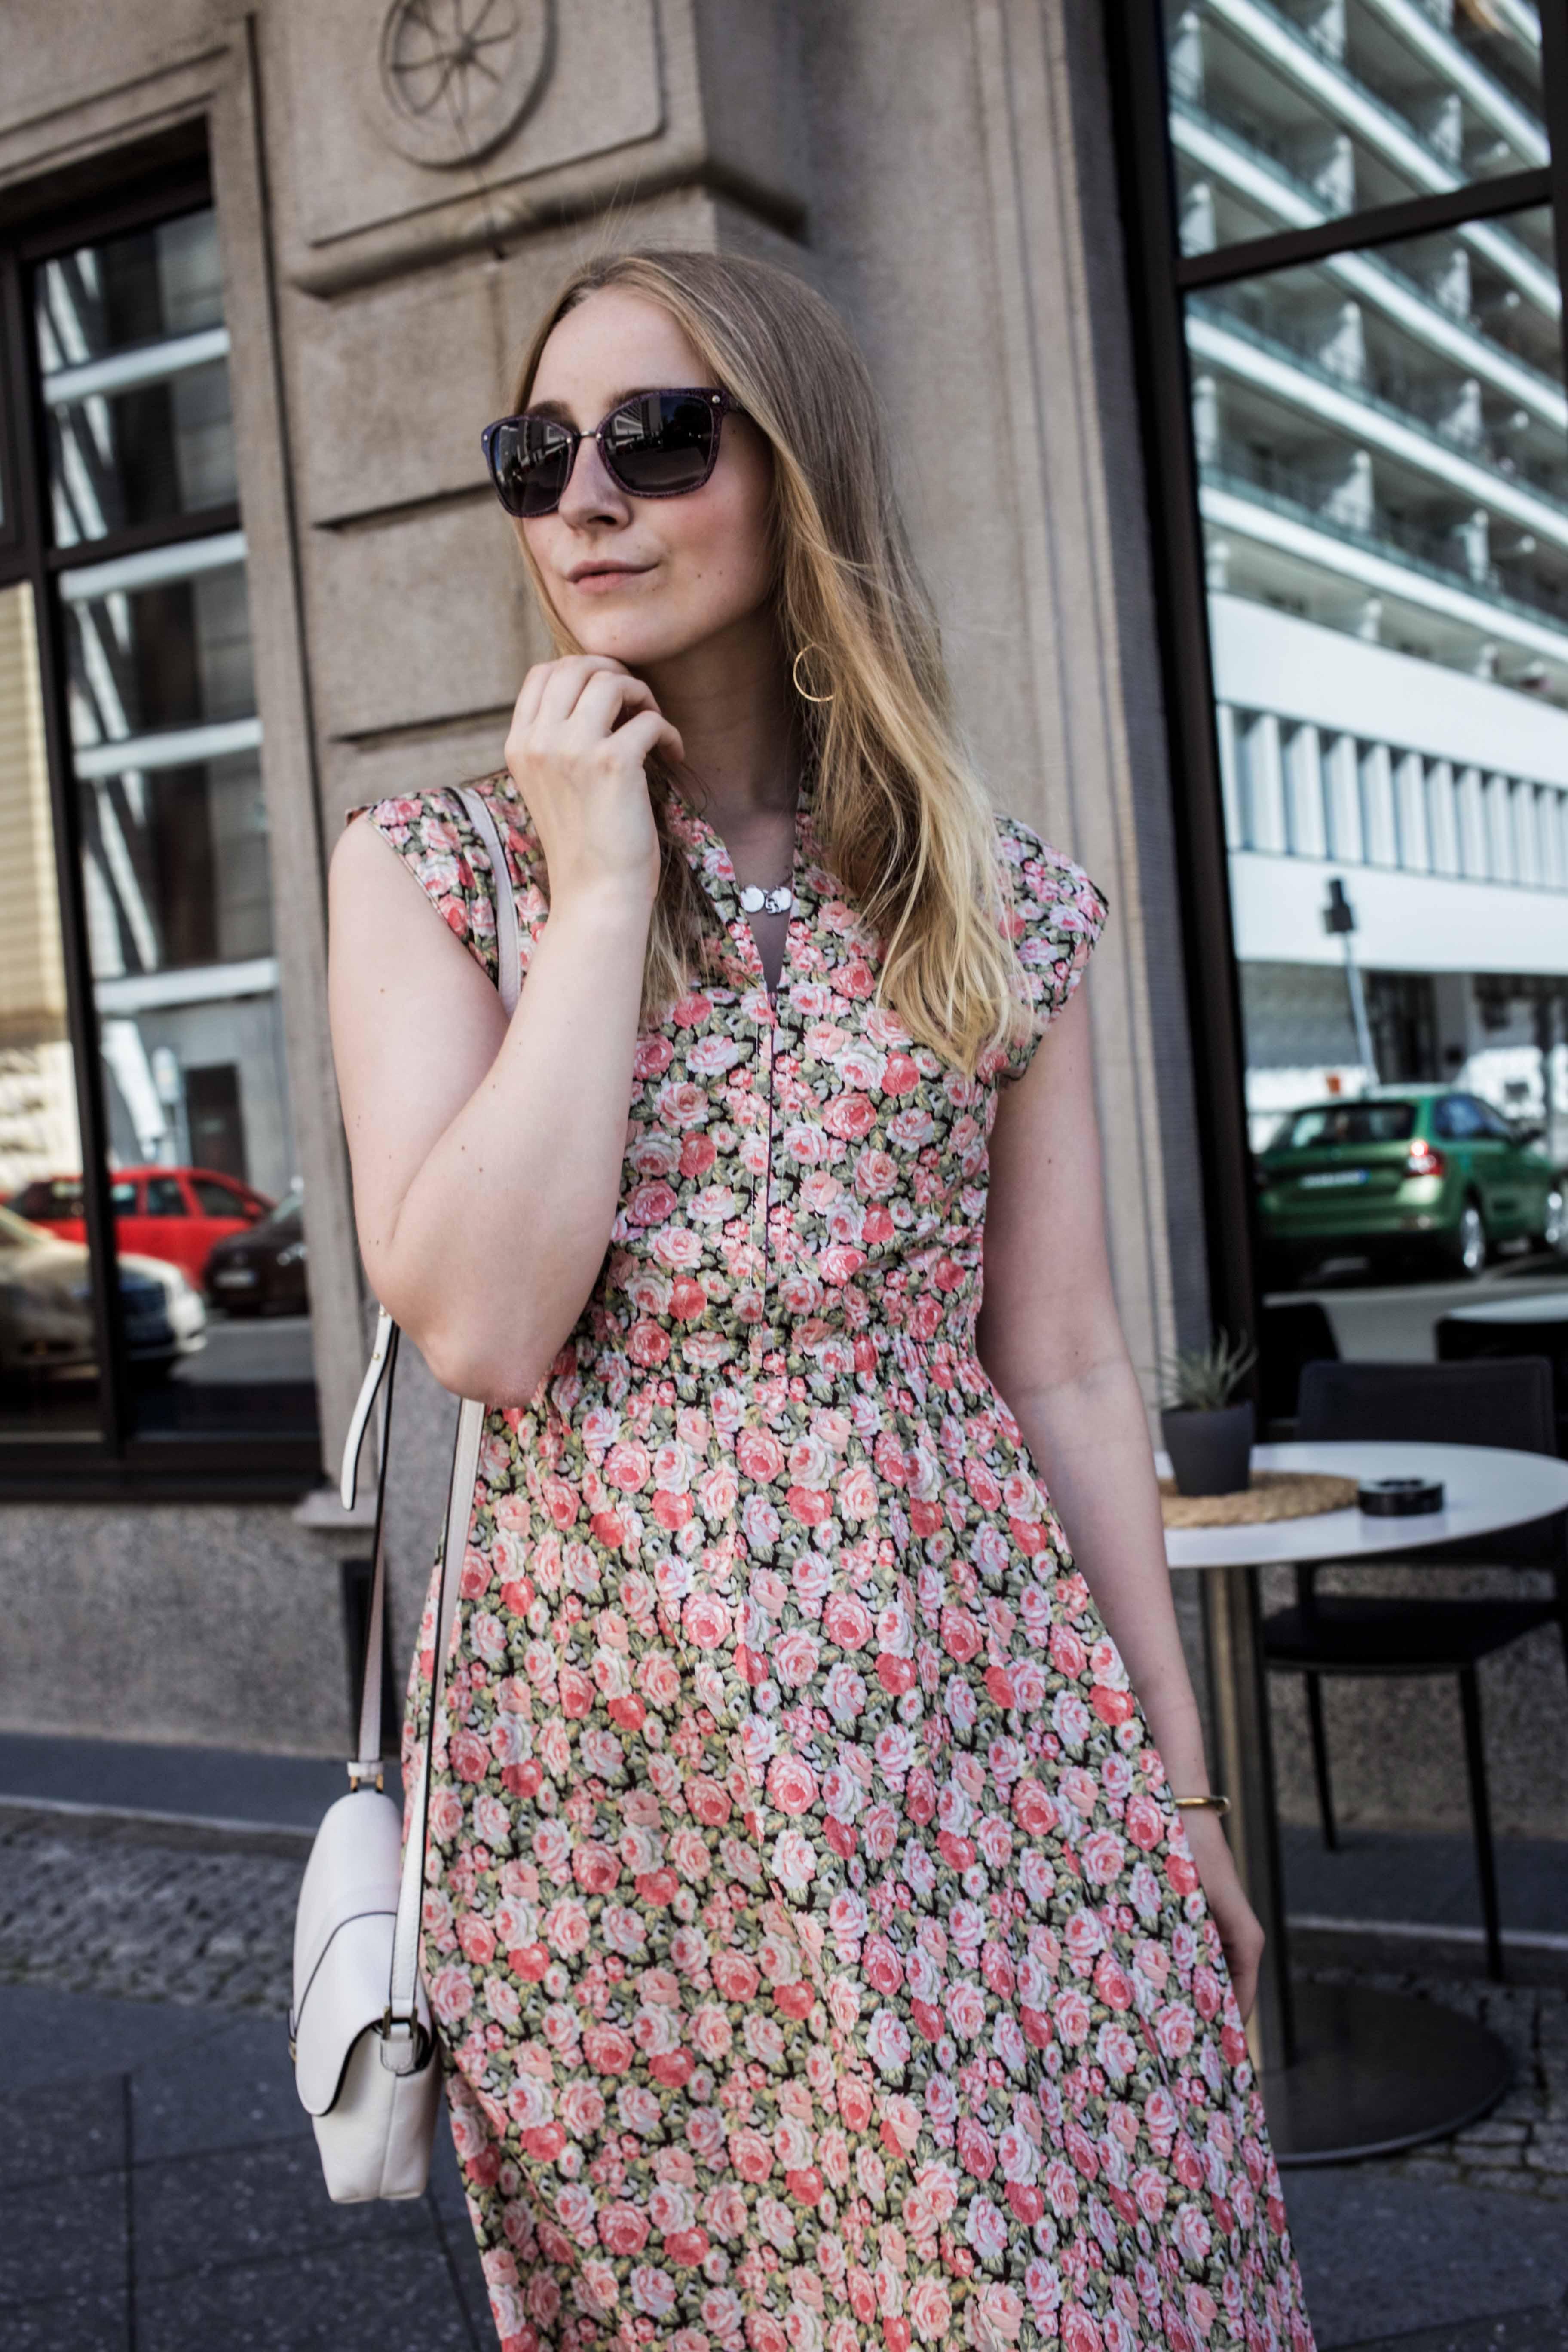 80er-jahre-blumenkleid-paris-vintage-lover-second-hand-outfit-look-fashionblogger-modeblog_7777